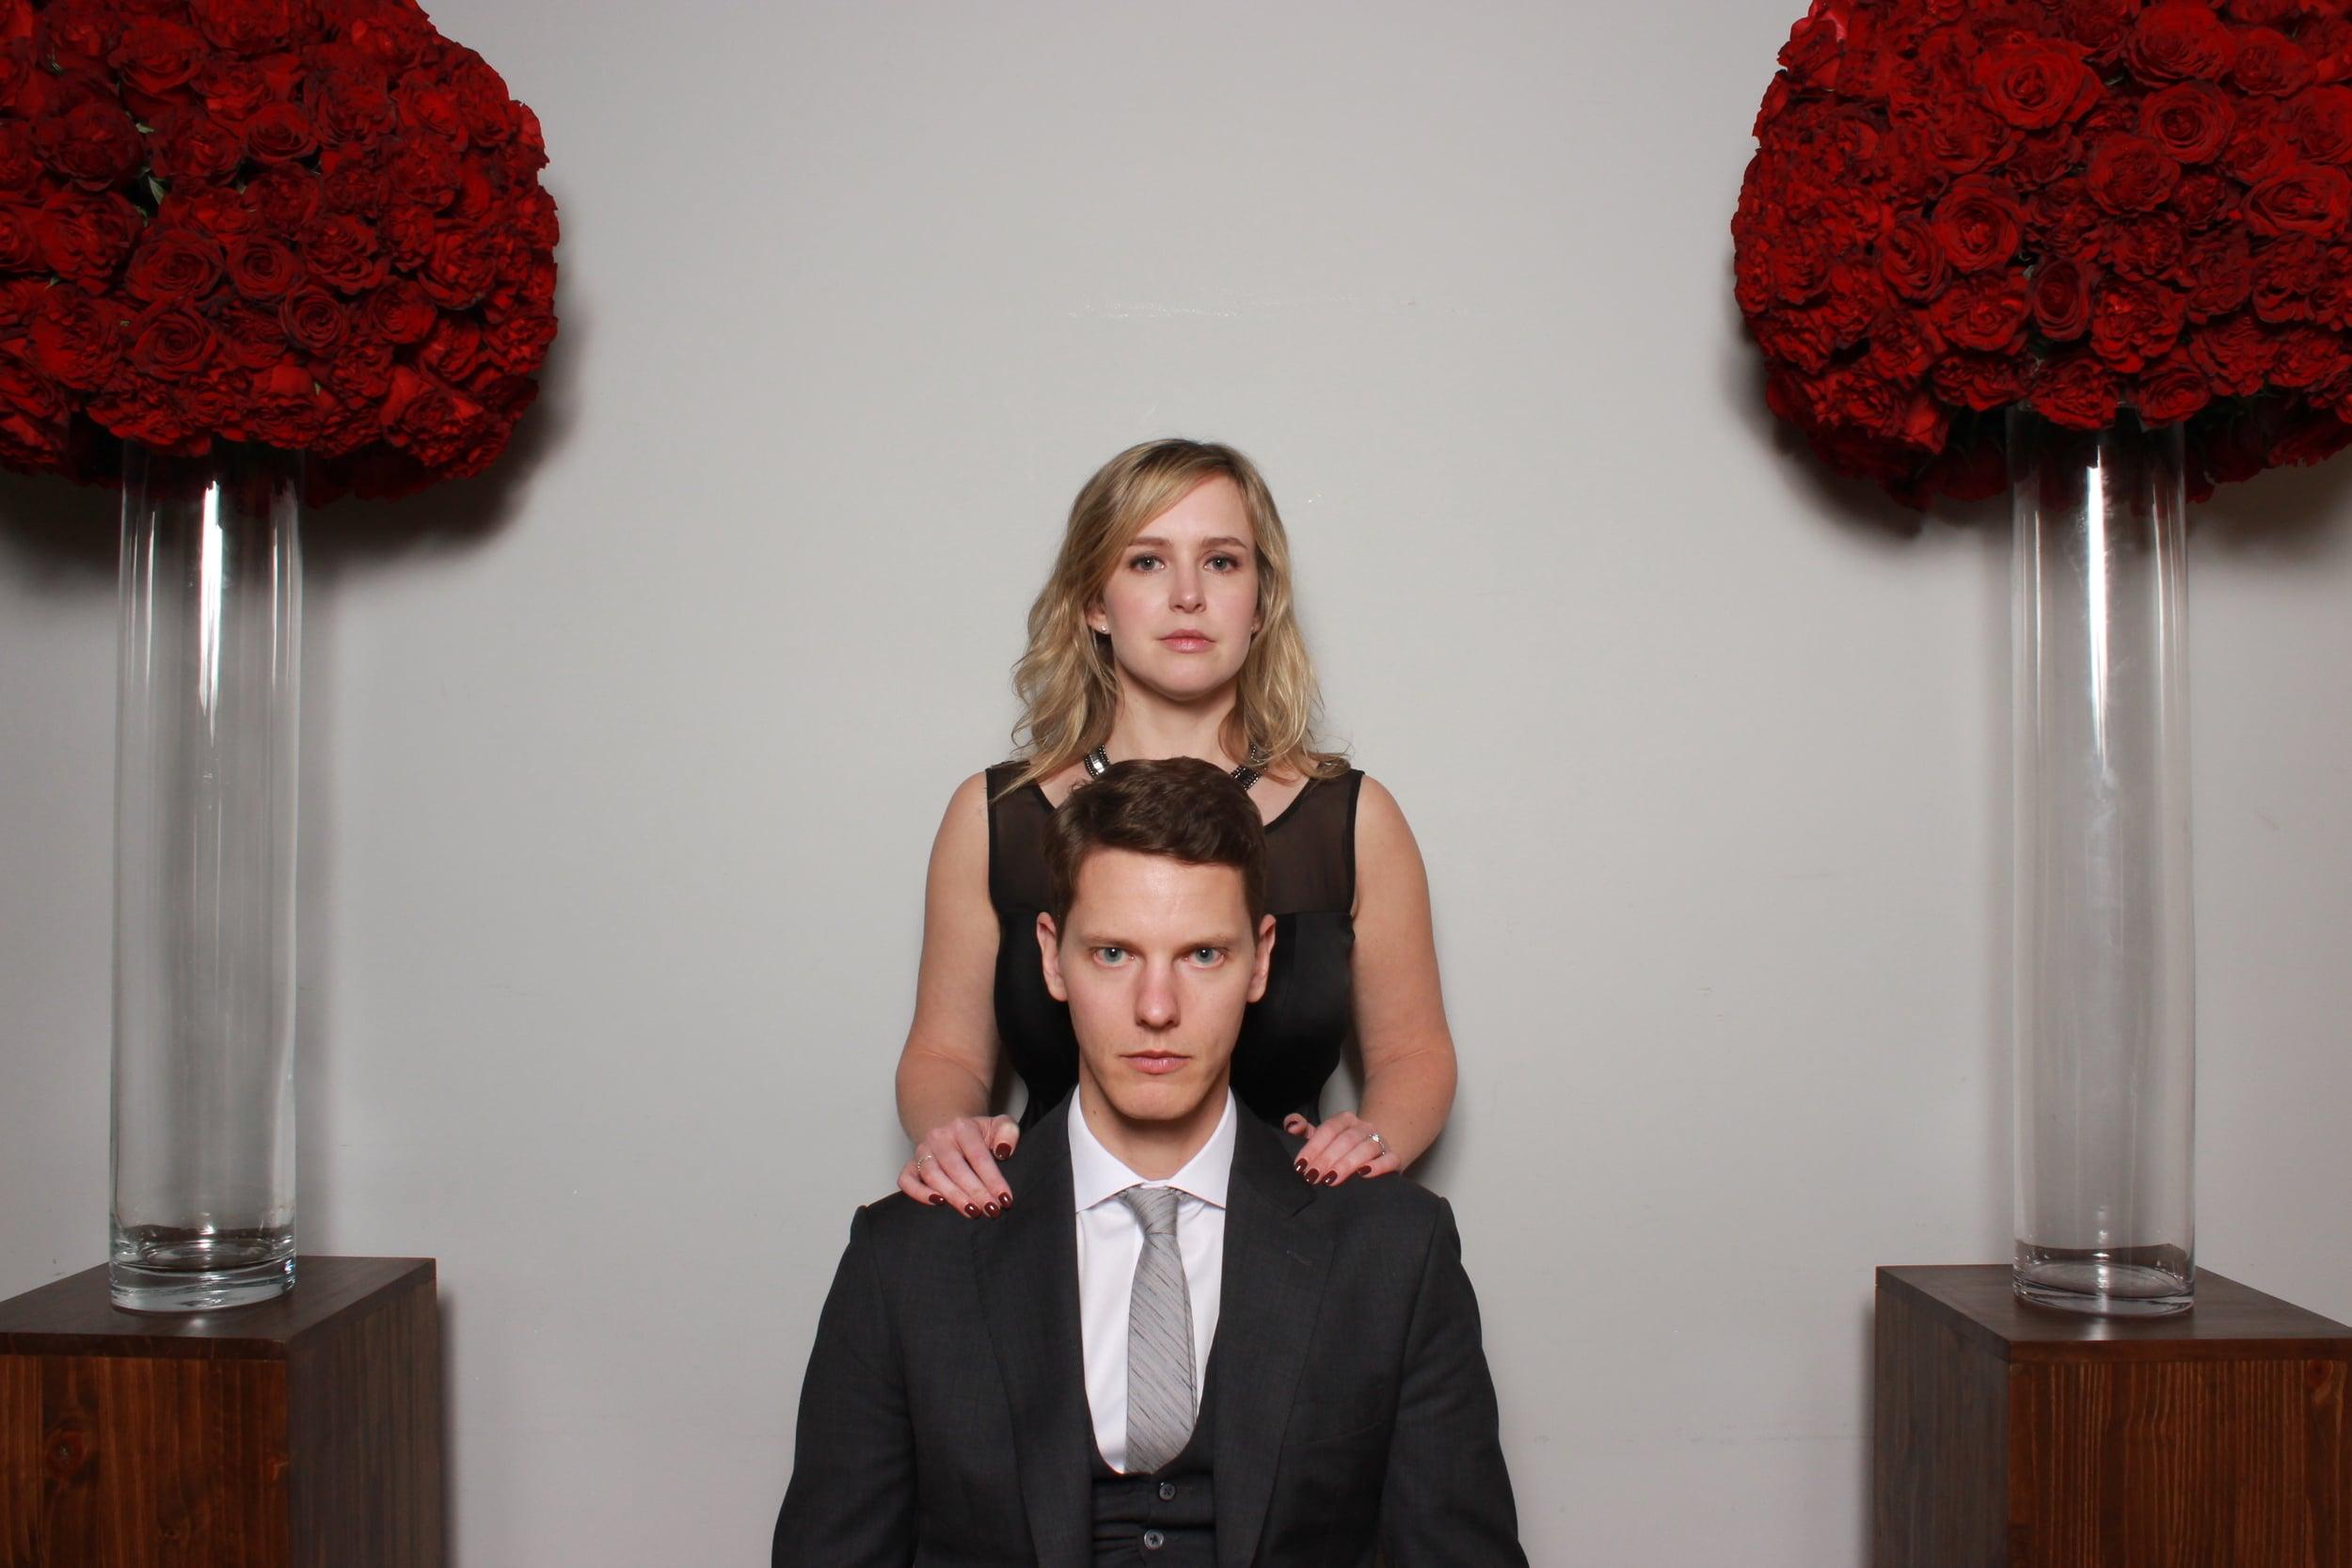 ottawa-wedding-photobooth-53.JPG